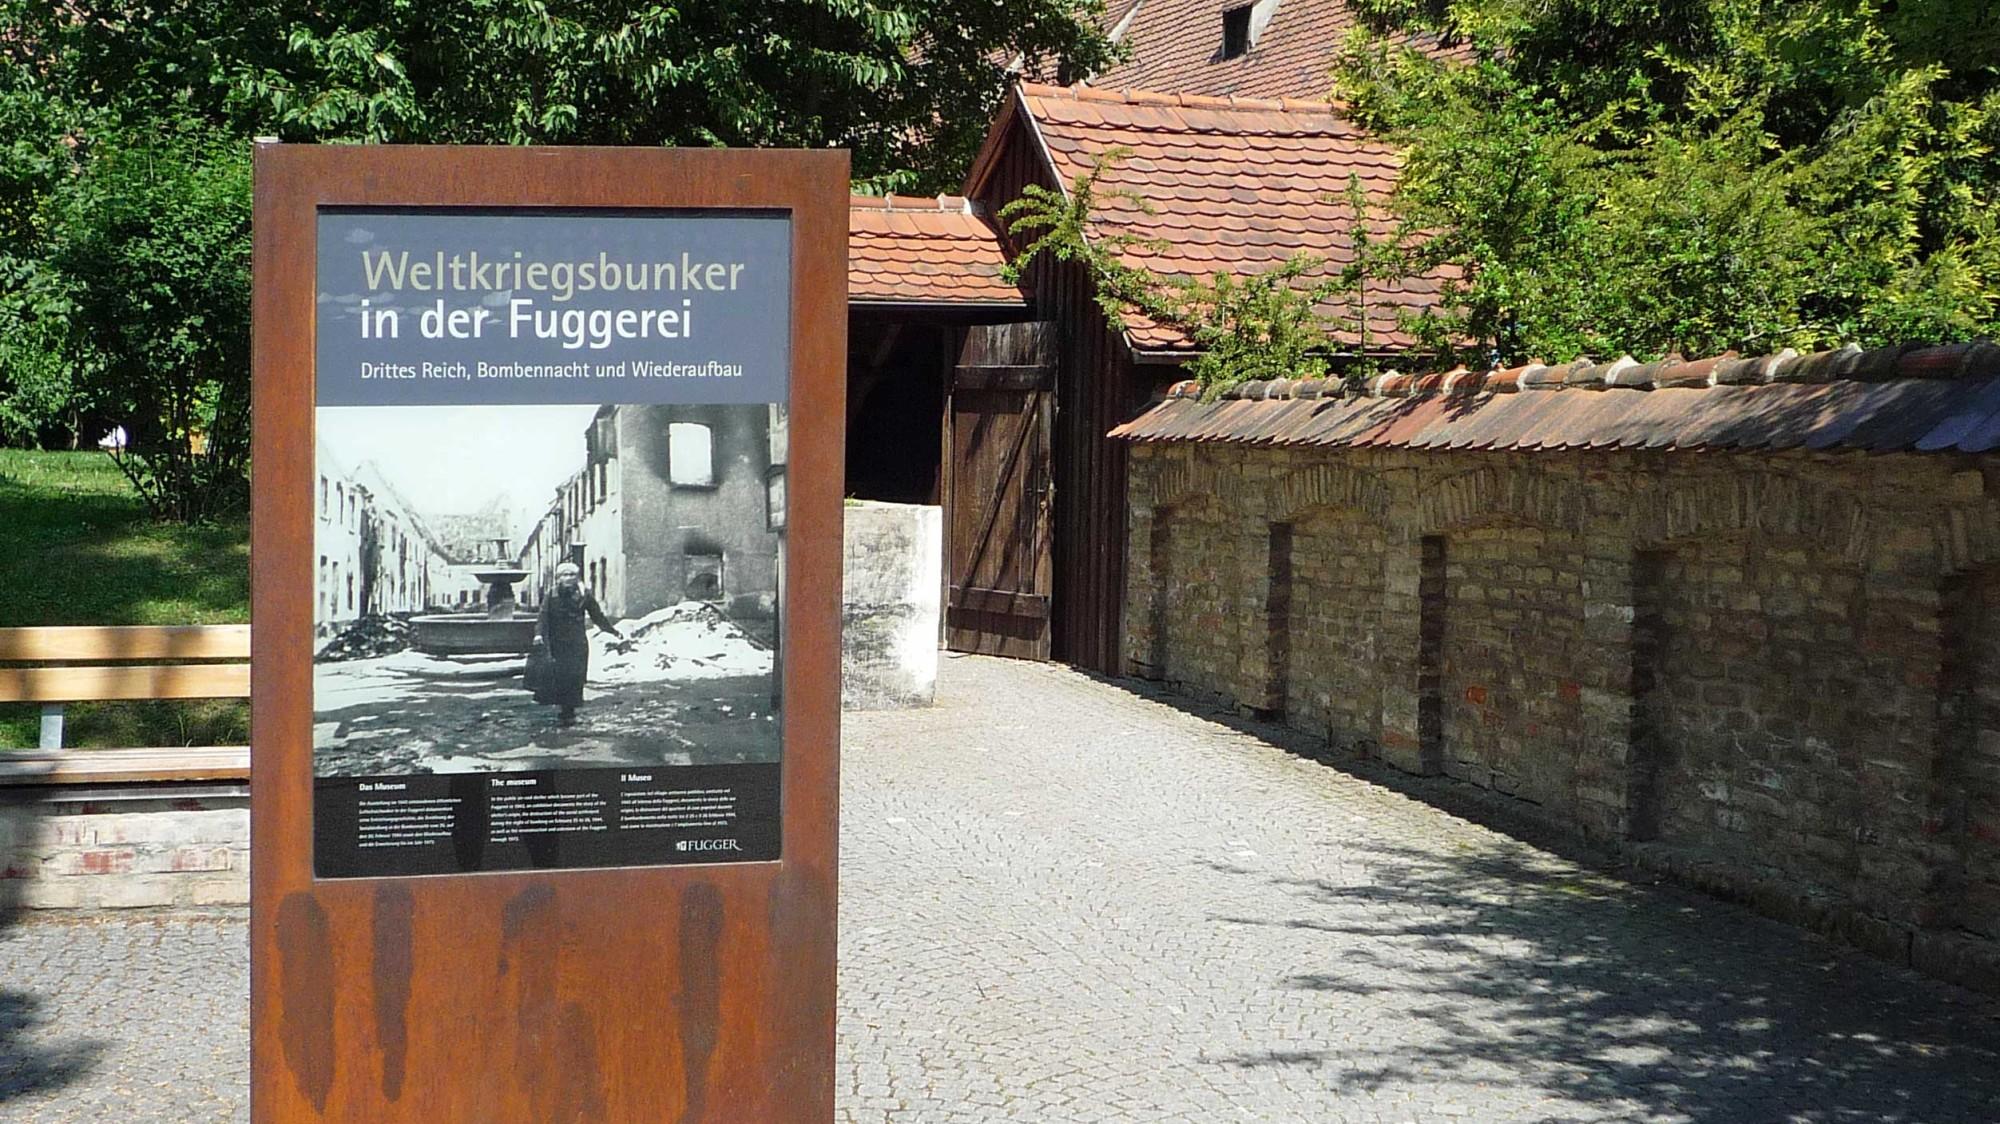 Augsburg: Fuggerei, vstup do protileteckého krytu